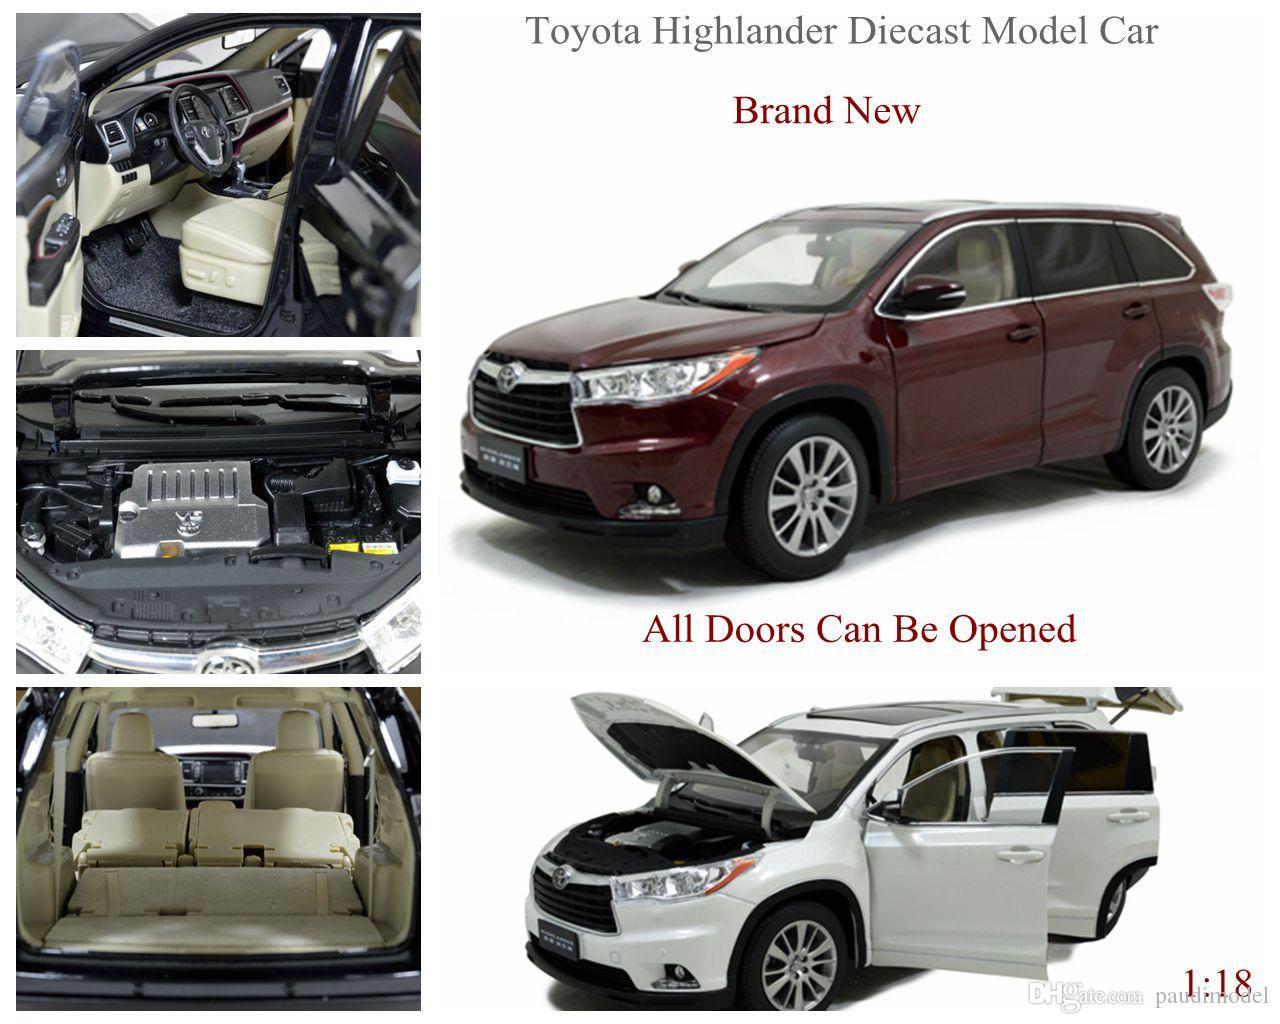 2019 Brand New Diecast Modell Car For Highlander 1 18 Scale Car